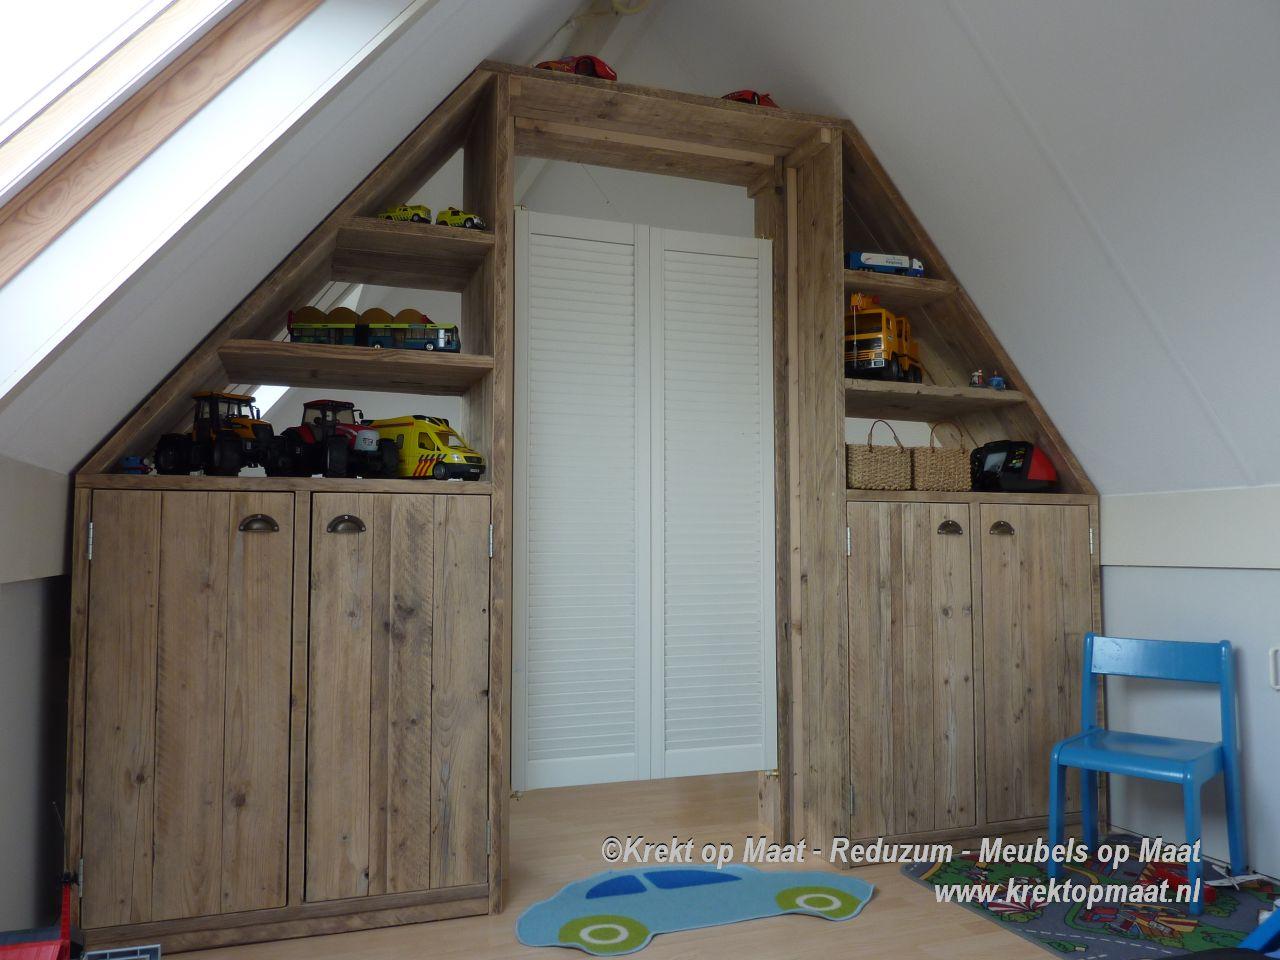 Stijlvolle Speeltafel Kinderkamer : Steigerhouten kast kinderkamer steigerhouten kinderkamer image